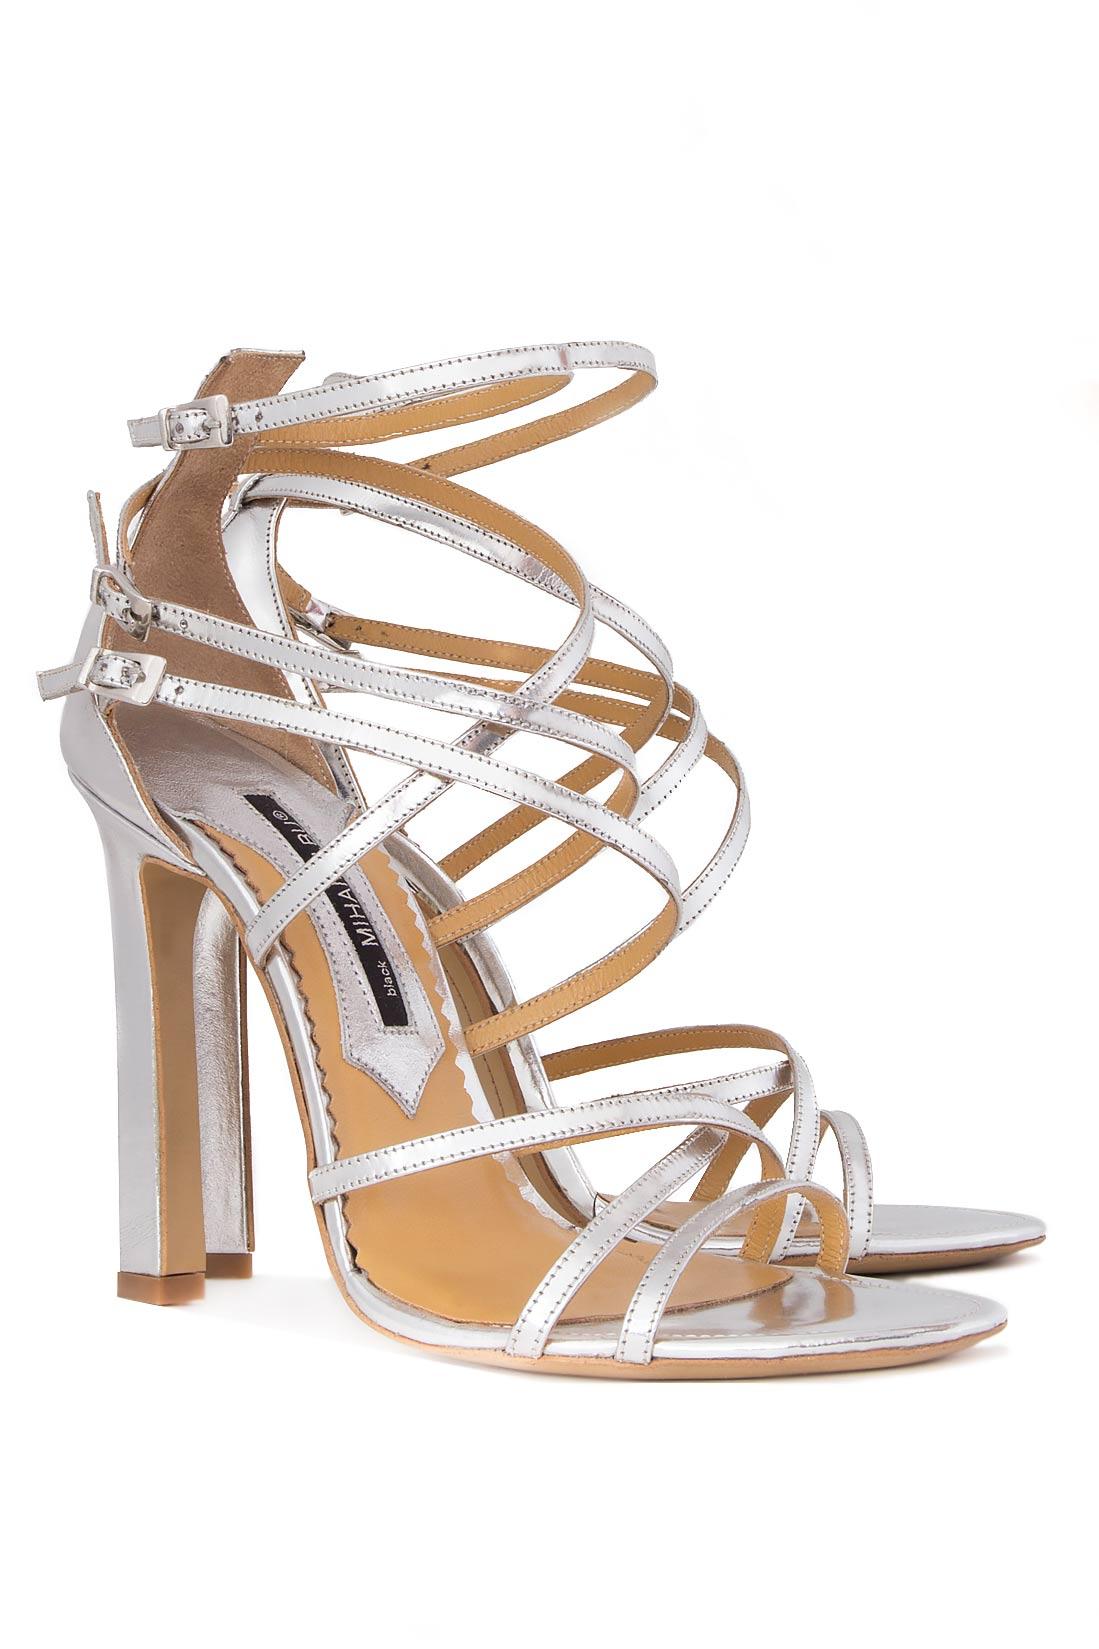 Sandale din piele metalizata Mihai Albu imagine 1